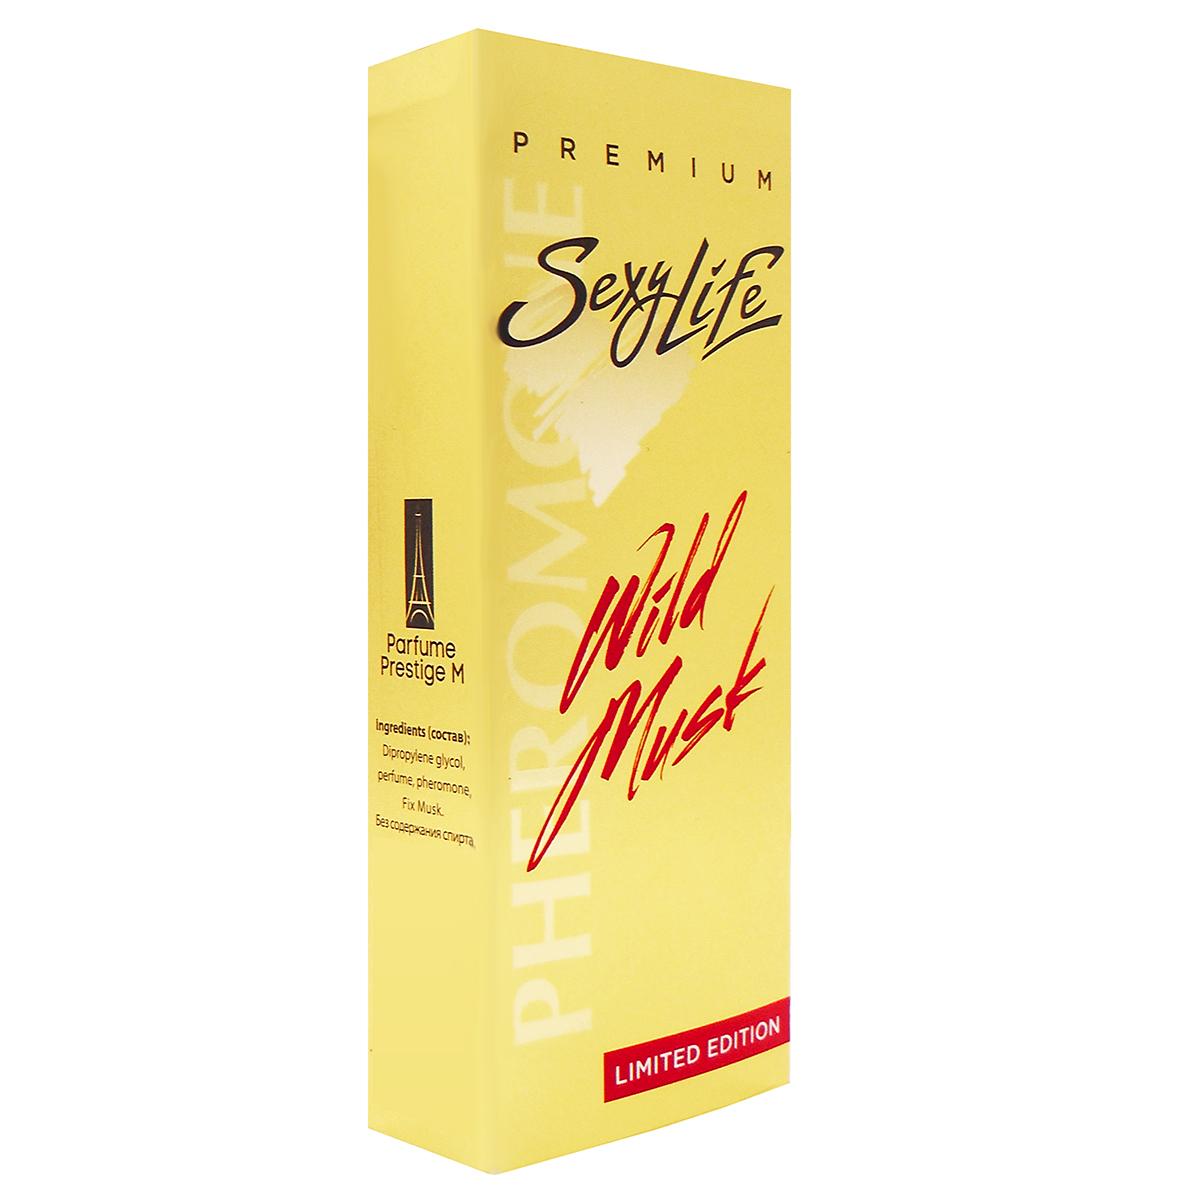 Wild Musk, Духи, № 2, женские, 10 мл lancome la vie est belle intense парфюмерная вода женская 75 мл